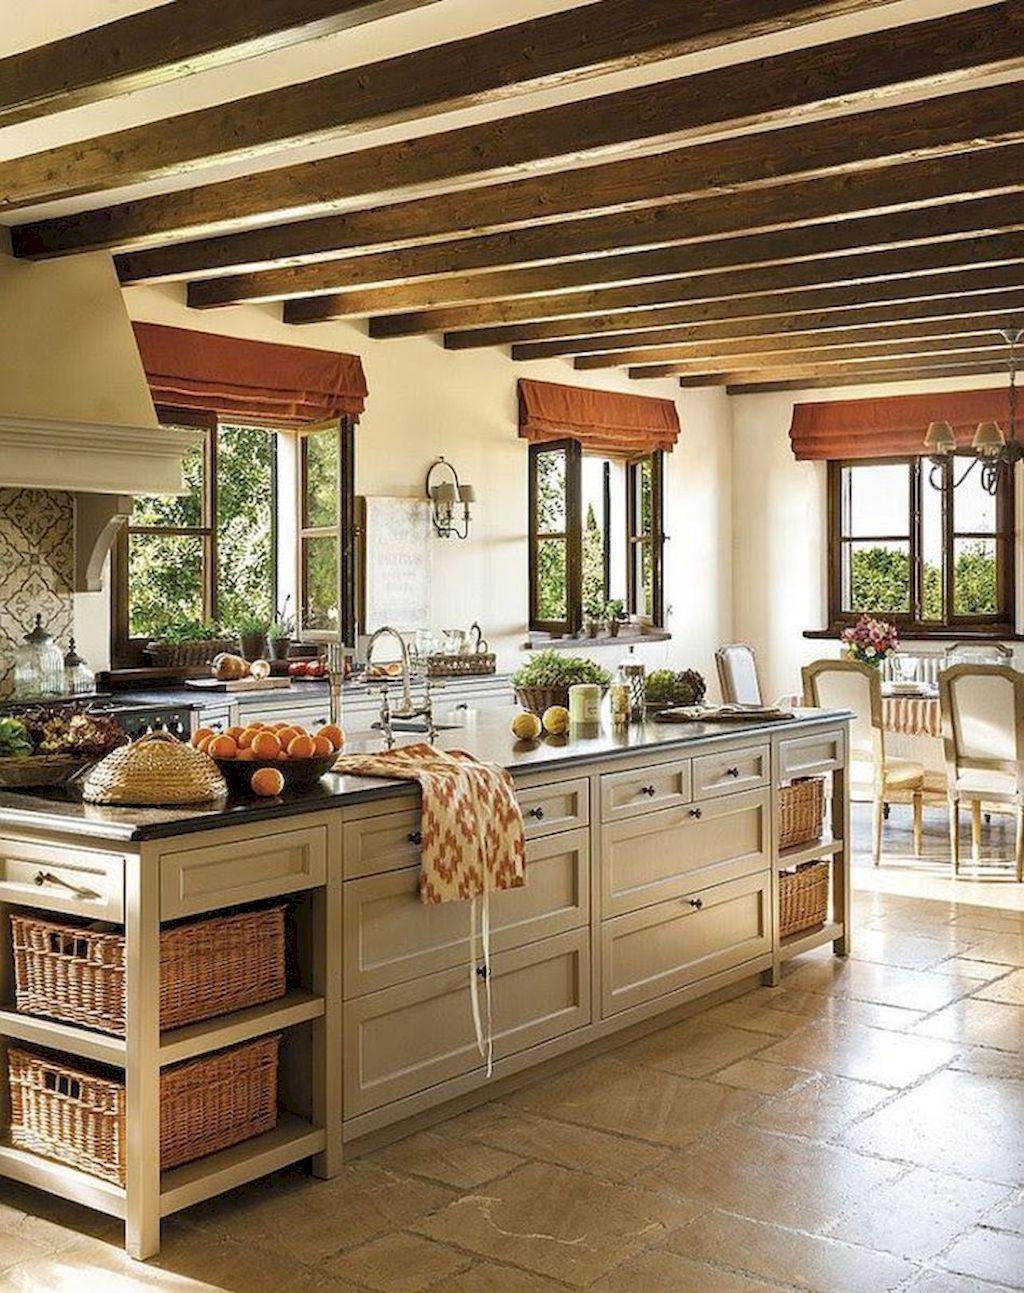 45 Best French Country Kitchen Design Ideas   Pinterest ...